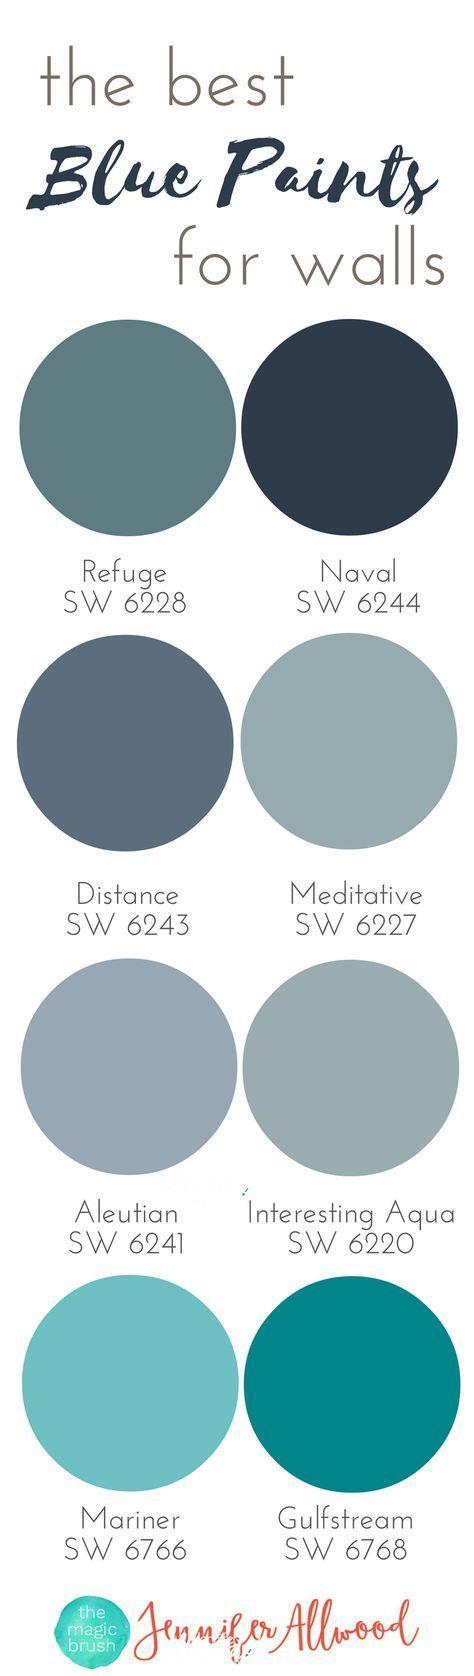 the best Blue Paints for walls   Magic Brush   Jennifer Allwood's Top 50 Wal... - Best Home Decor